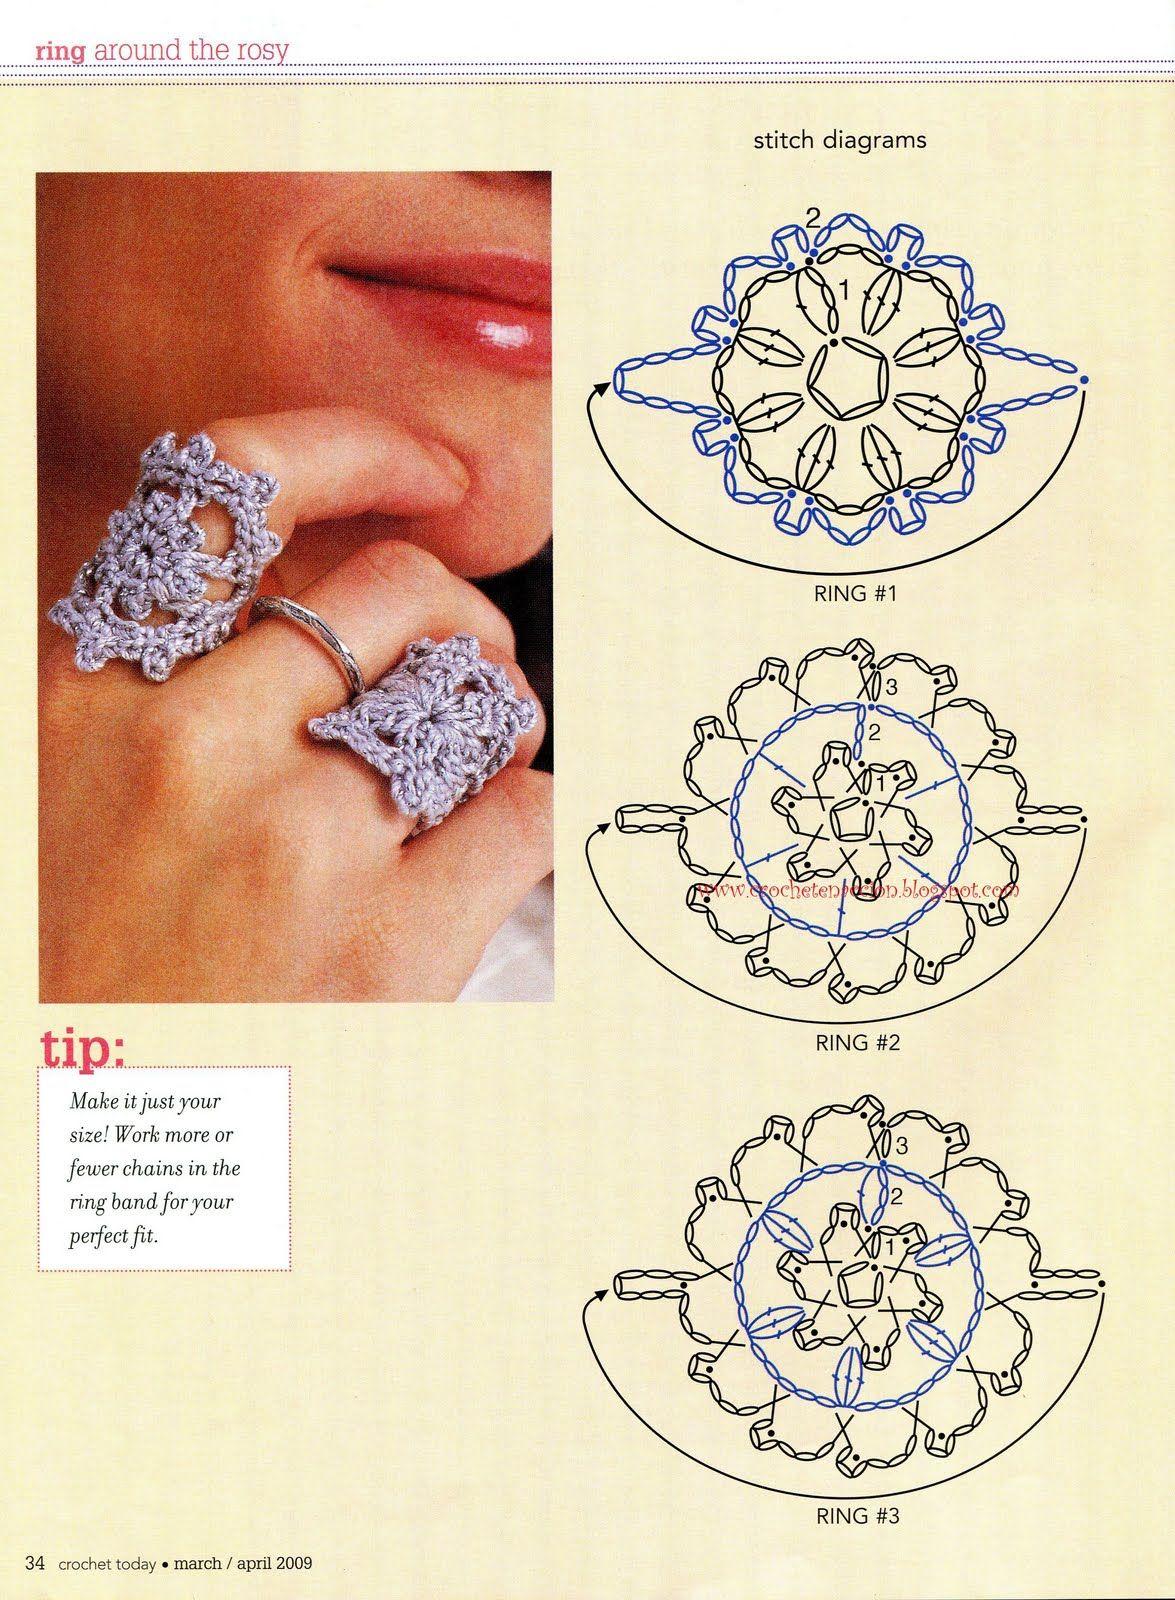 Patrones de Crochet | Crochet jewelry | Pinterest | Crochet, Crochet ...